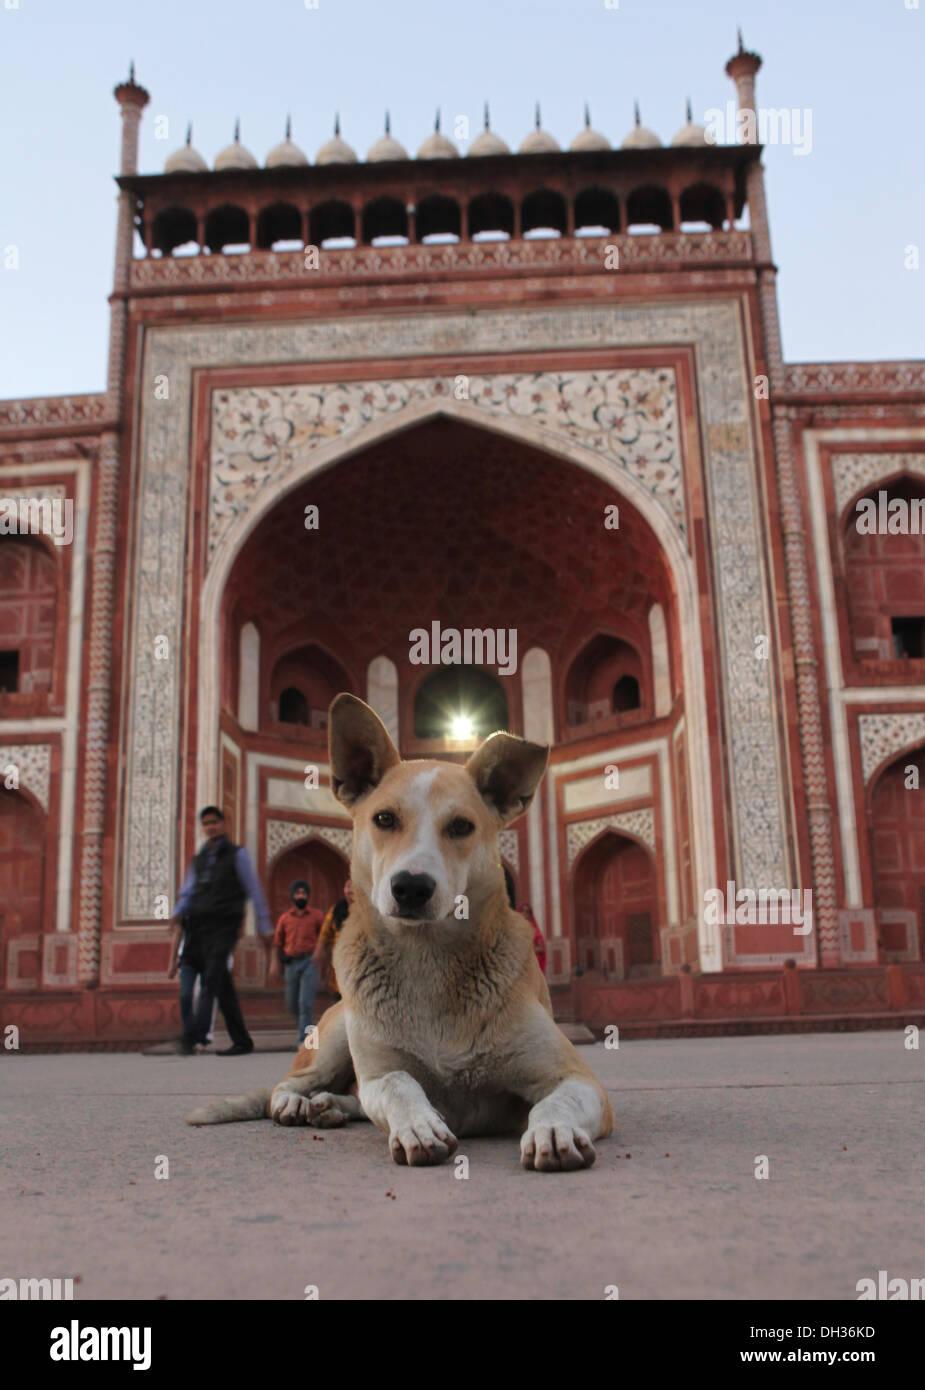 Hund vor dem Eingang zu den Taj Mahal, Agra, Uttar Pradesh, Indien, Asien Stockbild